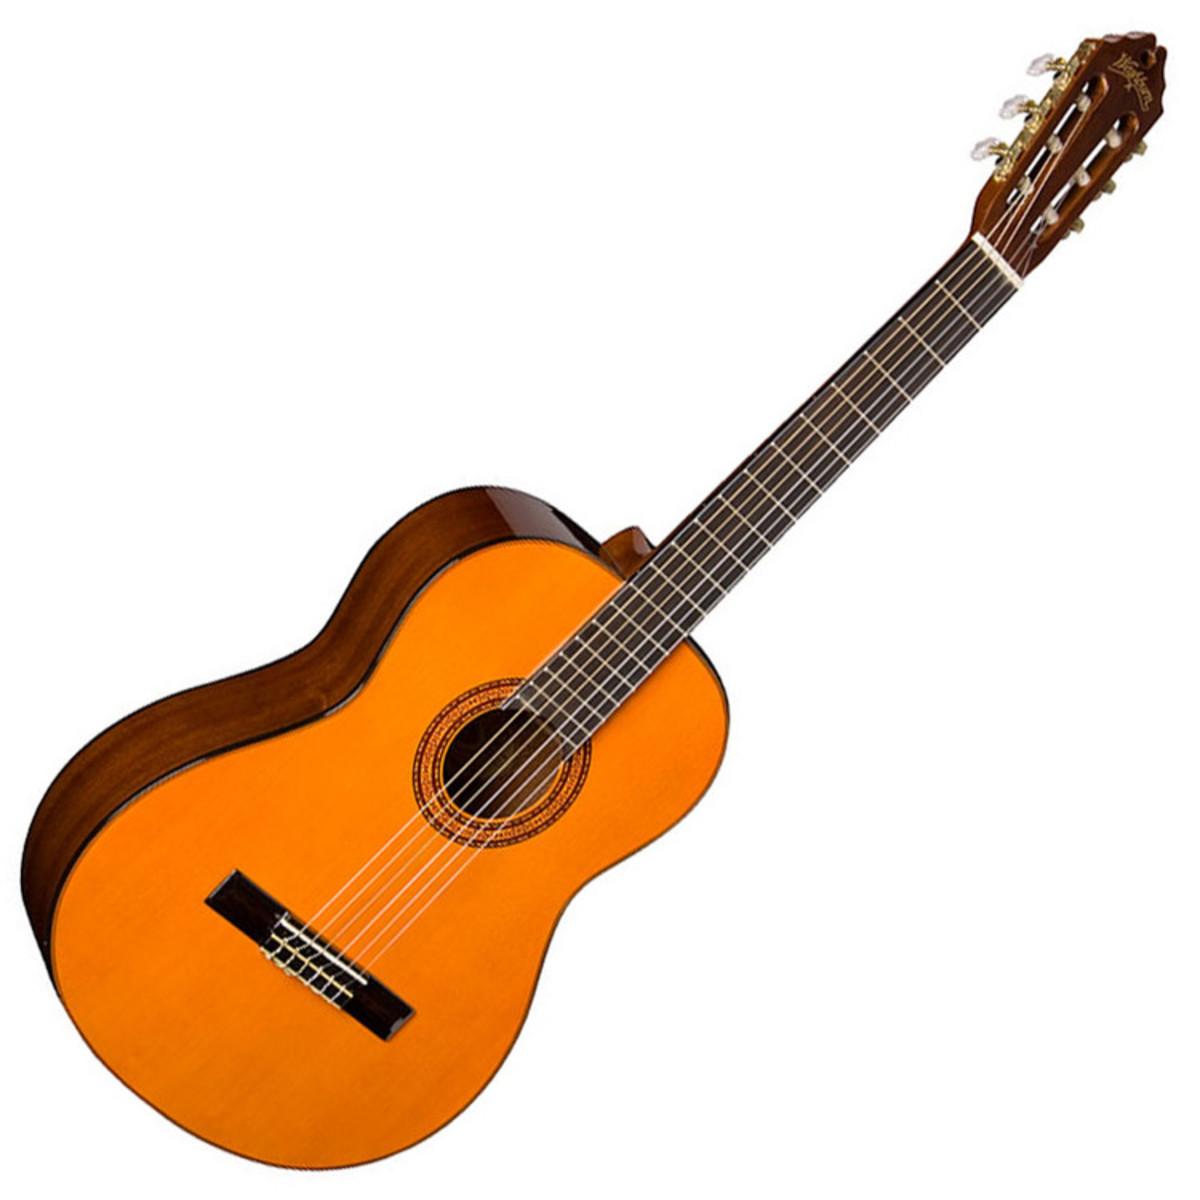 washburn c5 classical nylon string acoustic guitar natural at. Black Bedroom Furniture Sets. Home Design Ideas